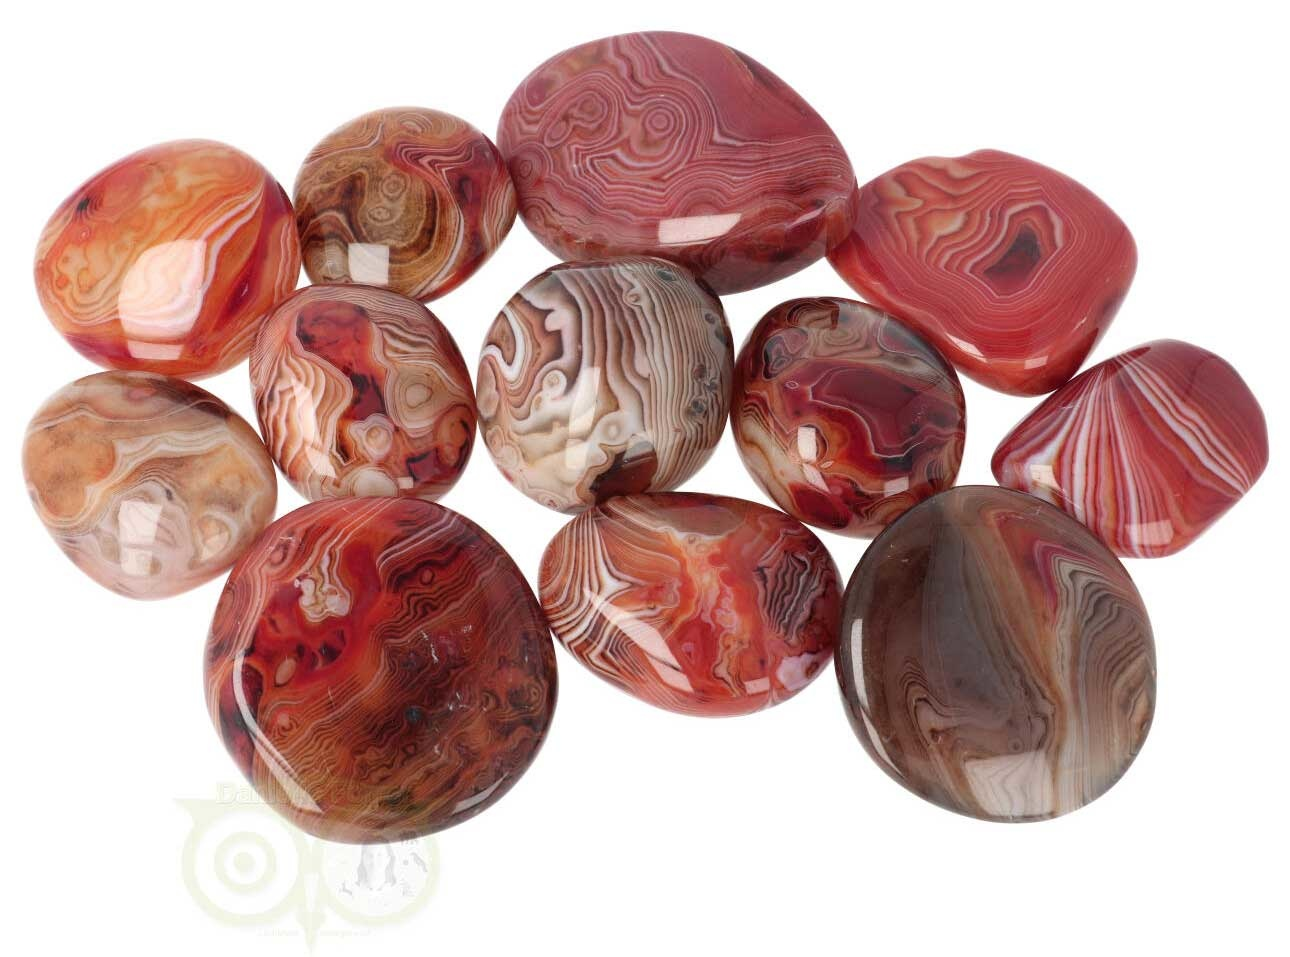 Rode Agaat - Carneool Topkwaliteit Jumbo en edelstenen | Edelstenen Webwinkel - Webshop Danielle Forrer